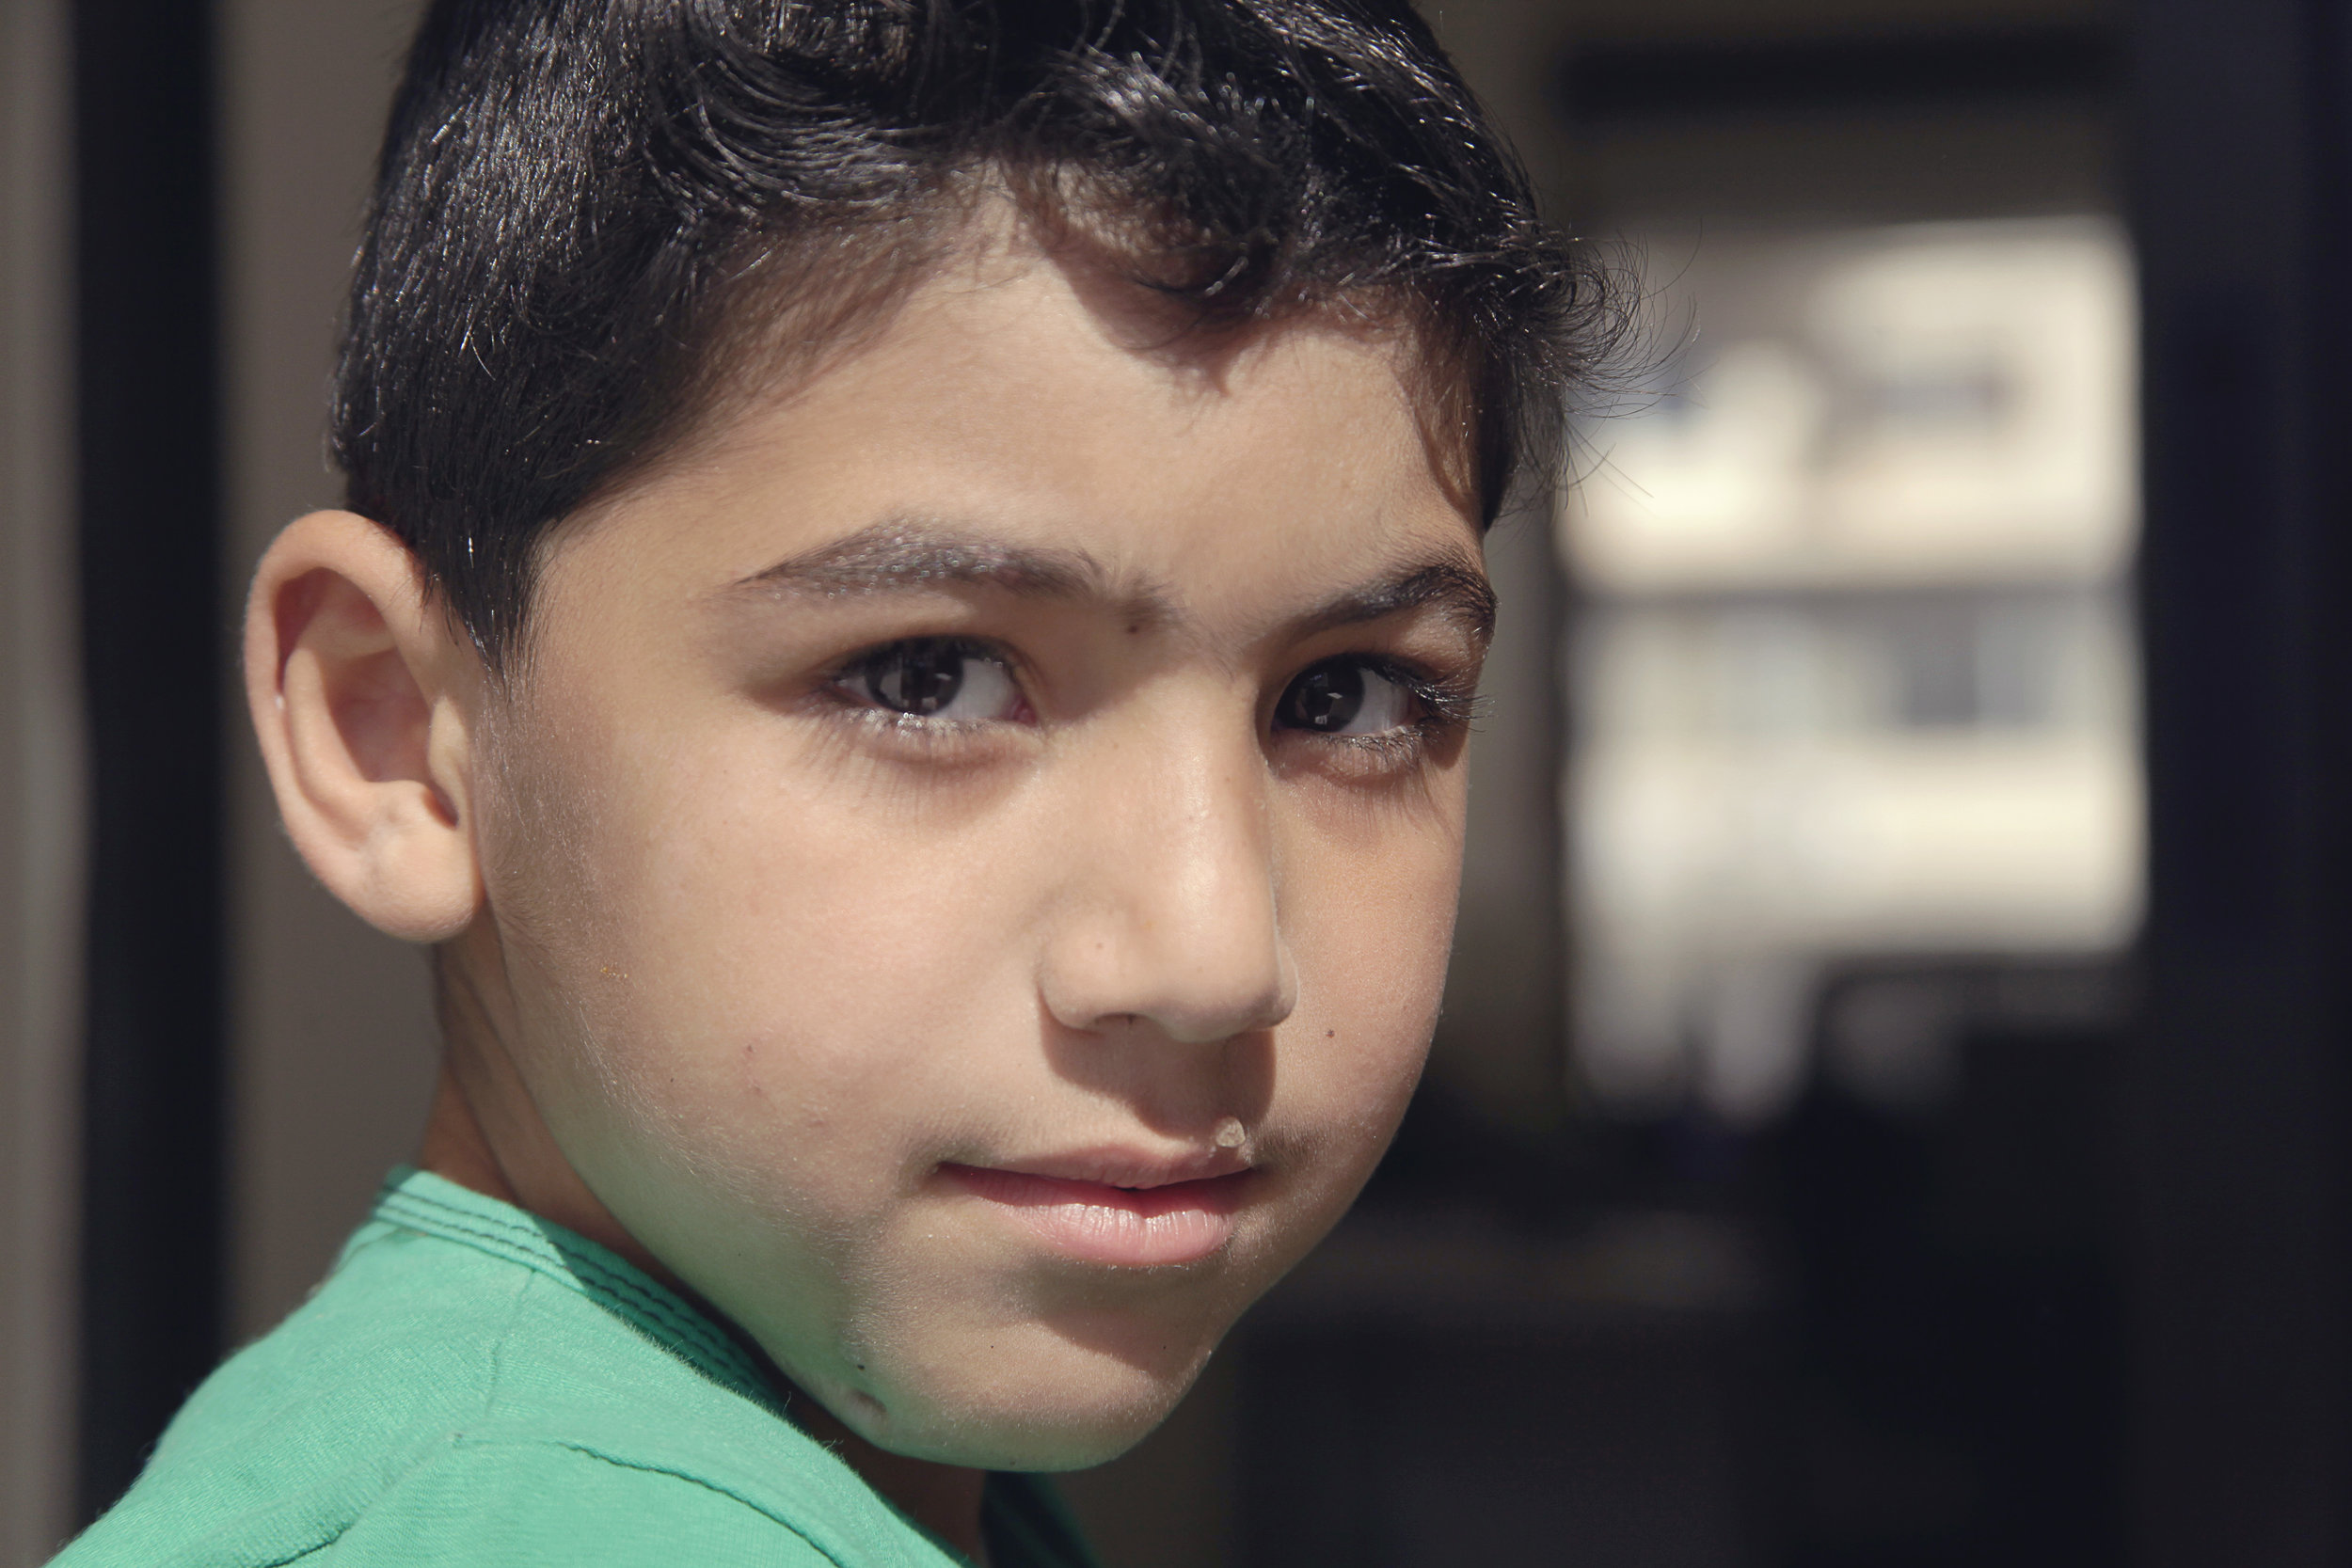 Ayyoub INARA Arwa Damon CNN Syrian refugee child